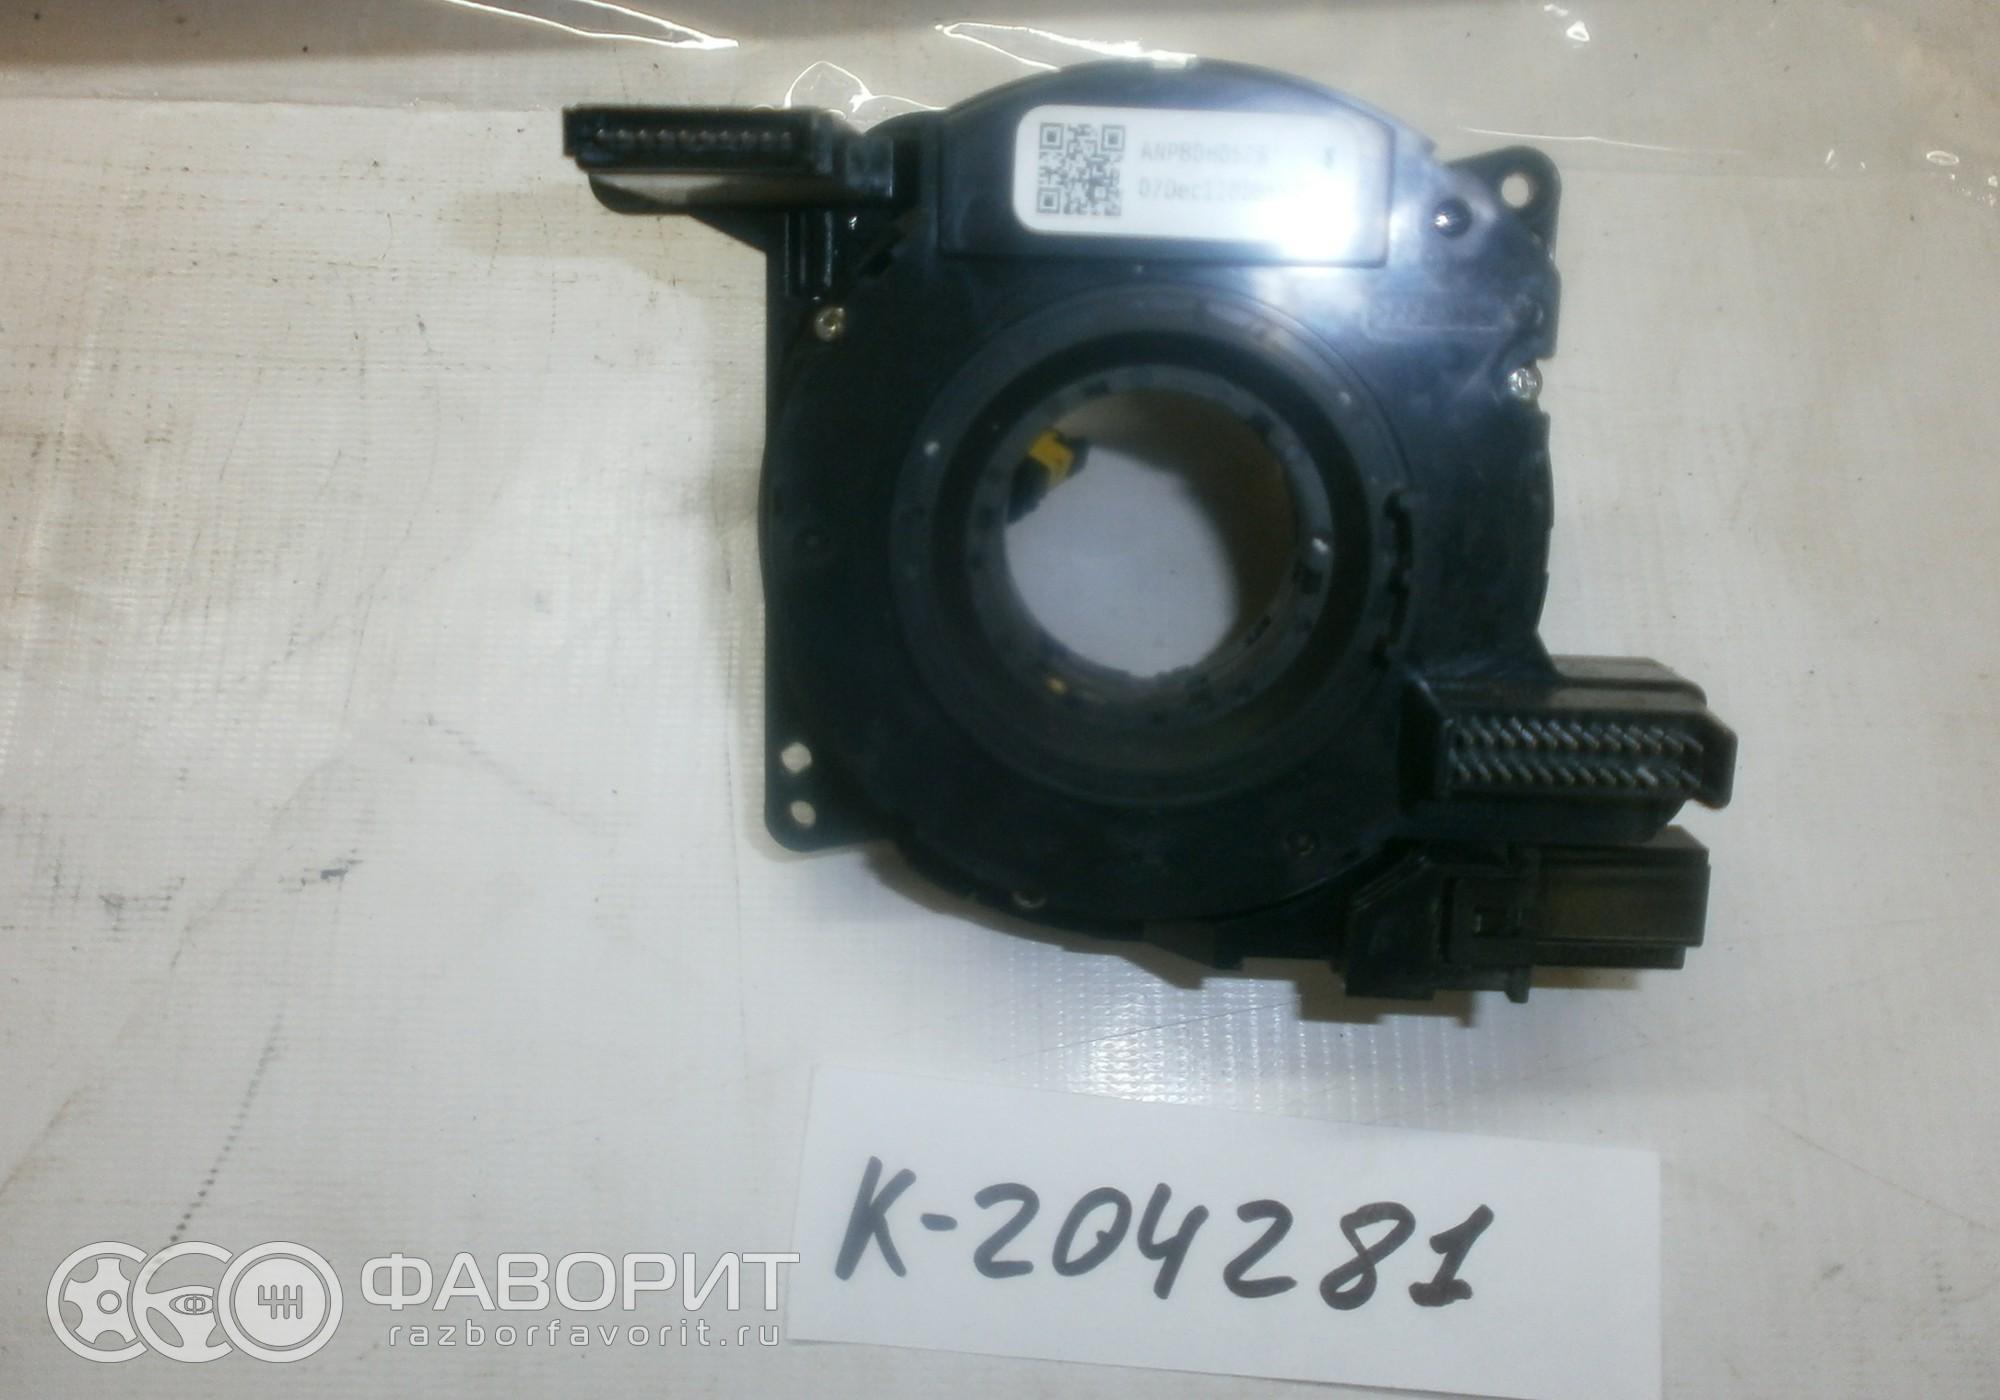 ford с max датчик угла поворота фото